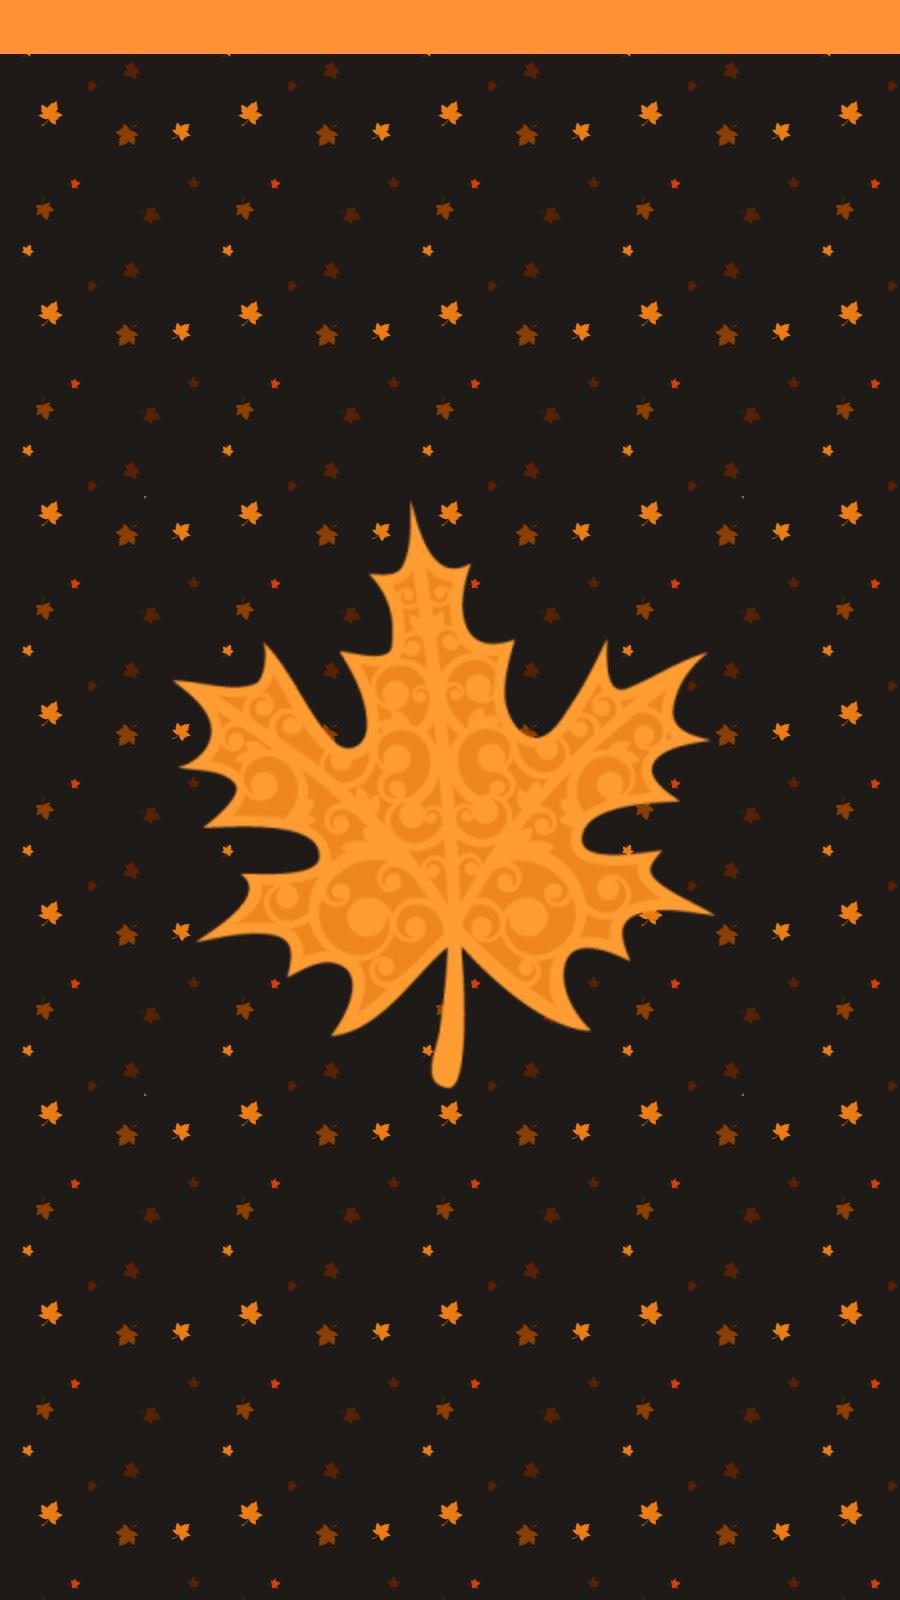 Wallpaper, Fall on Pinterest | iPhone wallpapers, Autumn ...